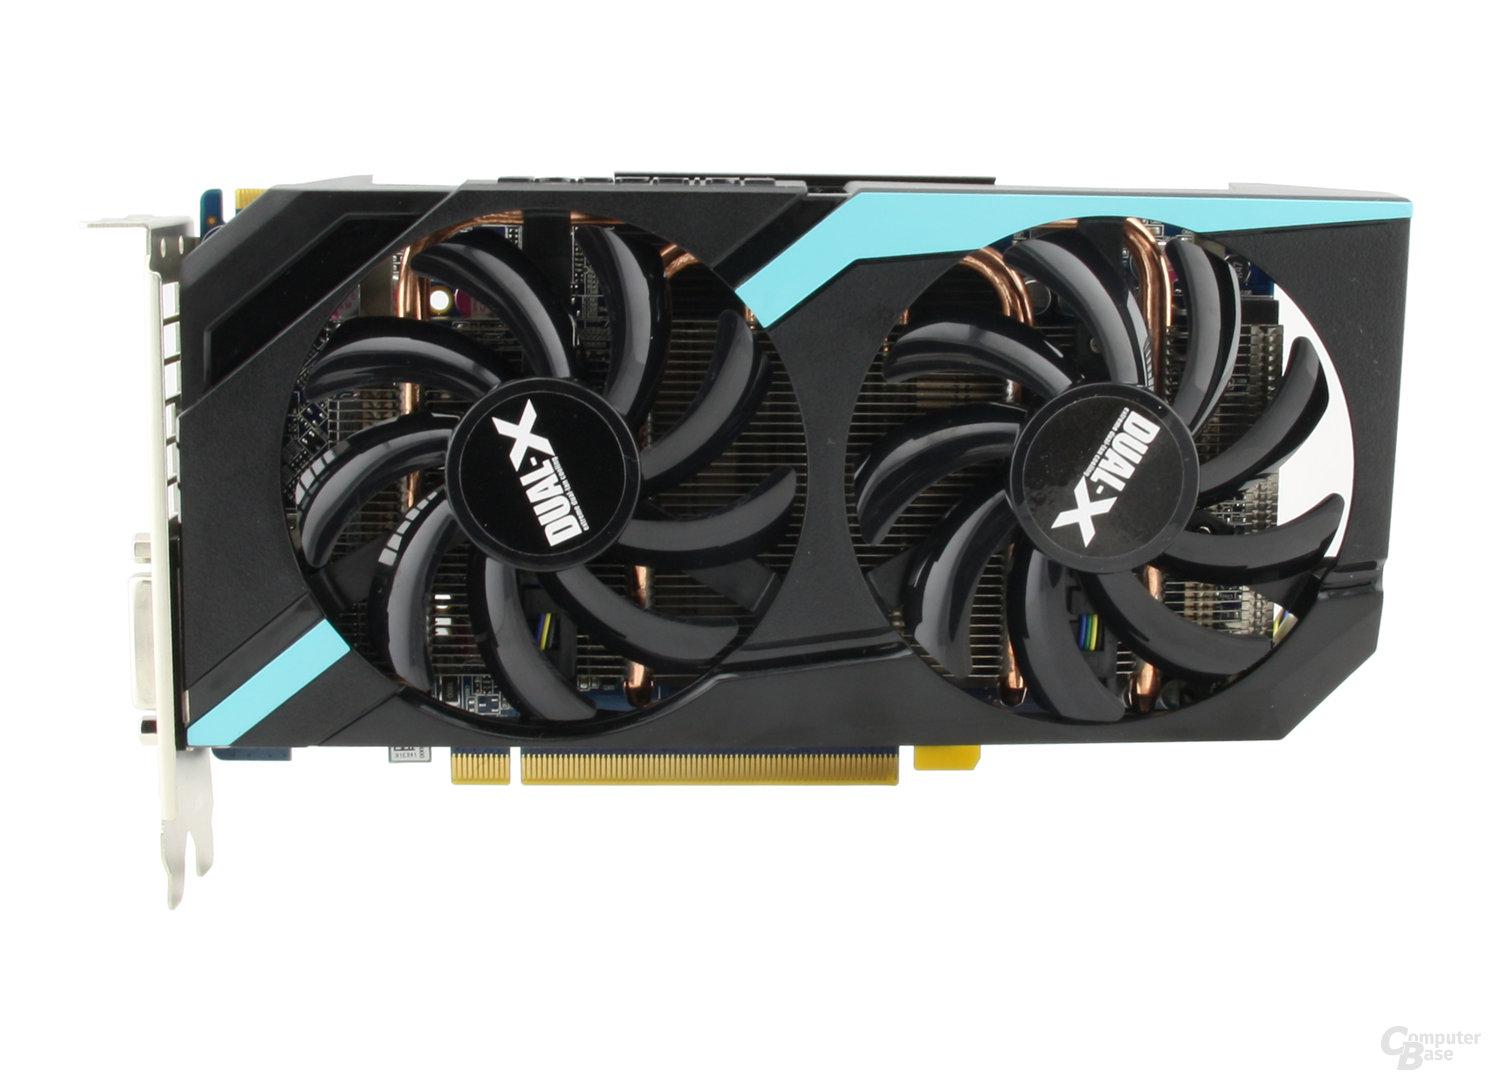 Sapphire Radeon HD 7870 Dual-X